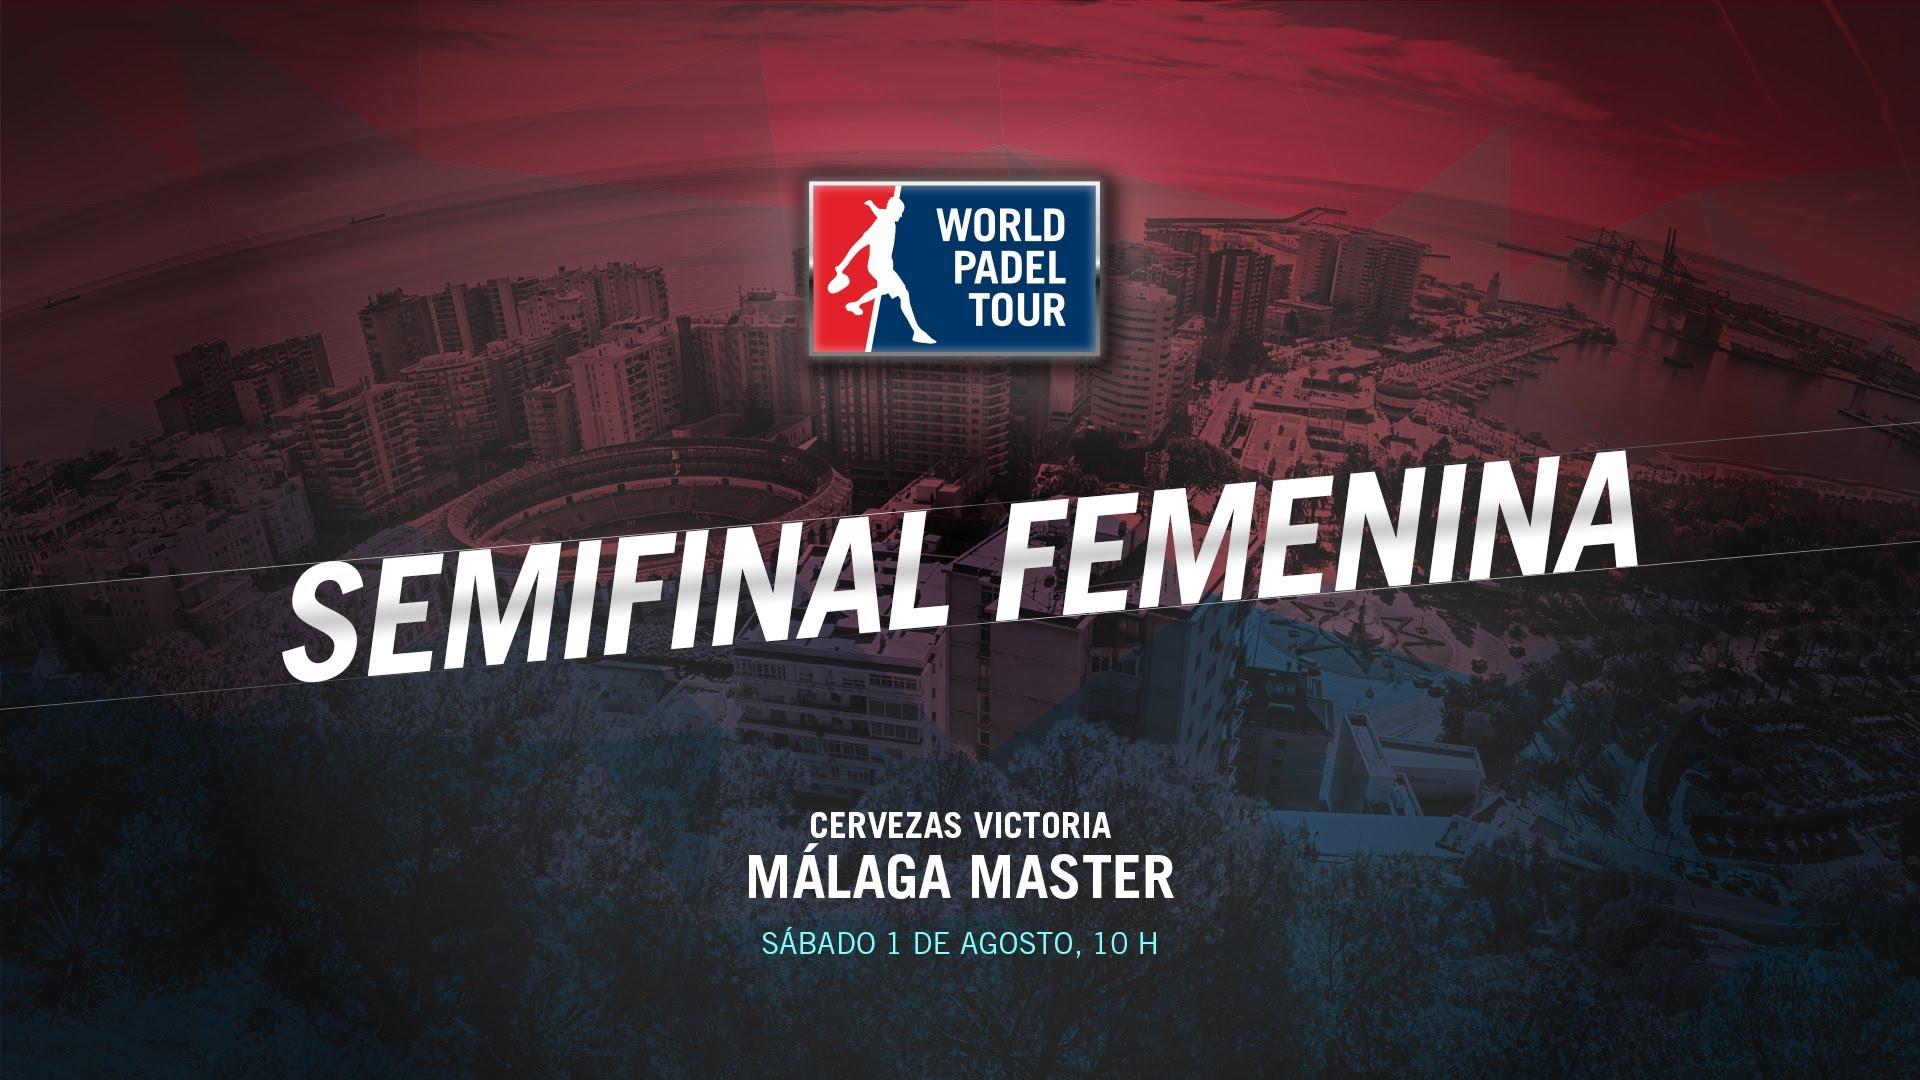 DIRECTO | SEMIFINALES FEMENINAS Málaga Master | World Padel Tour 2015